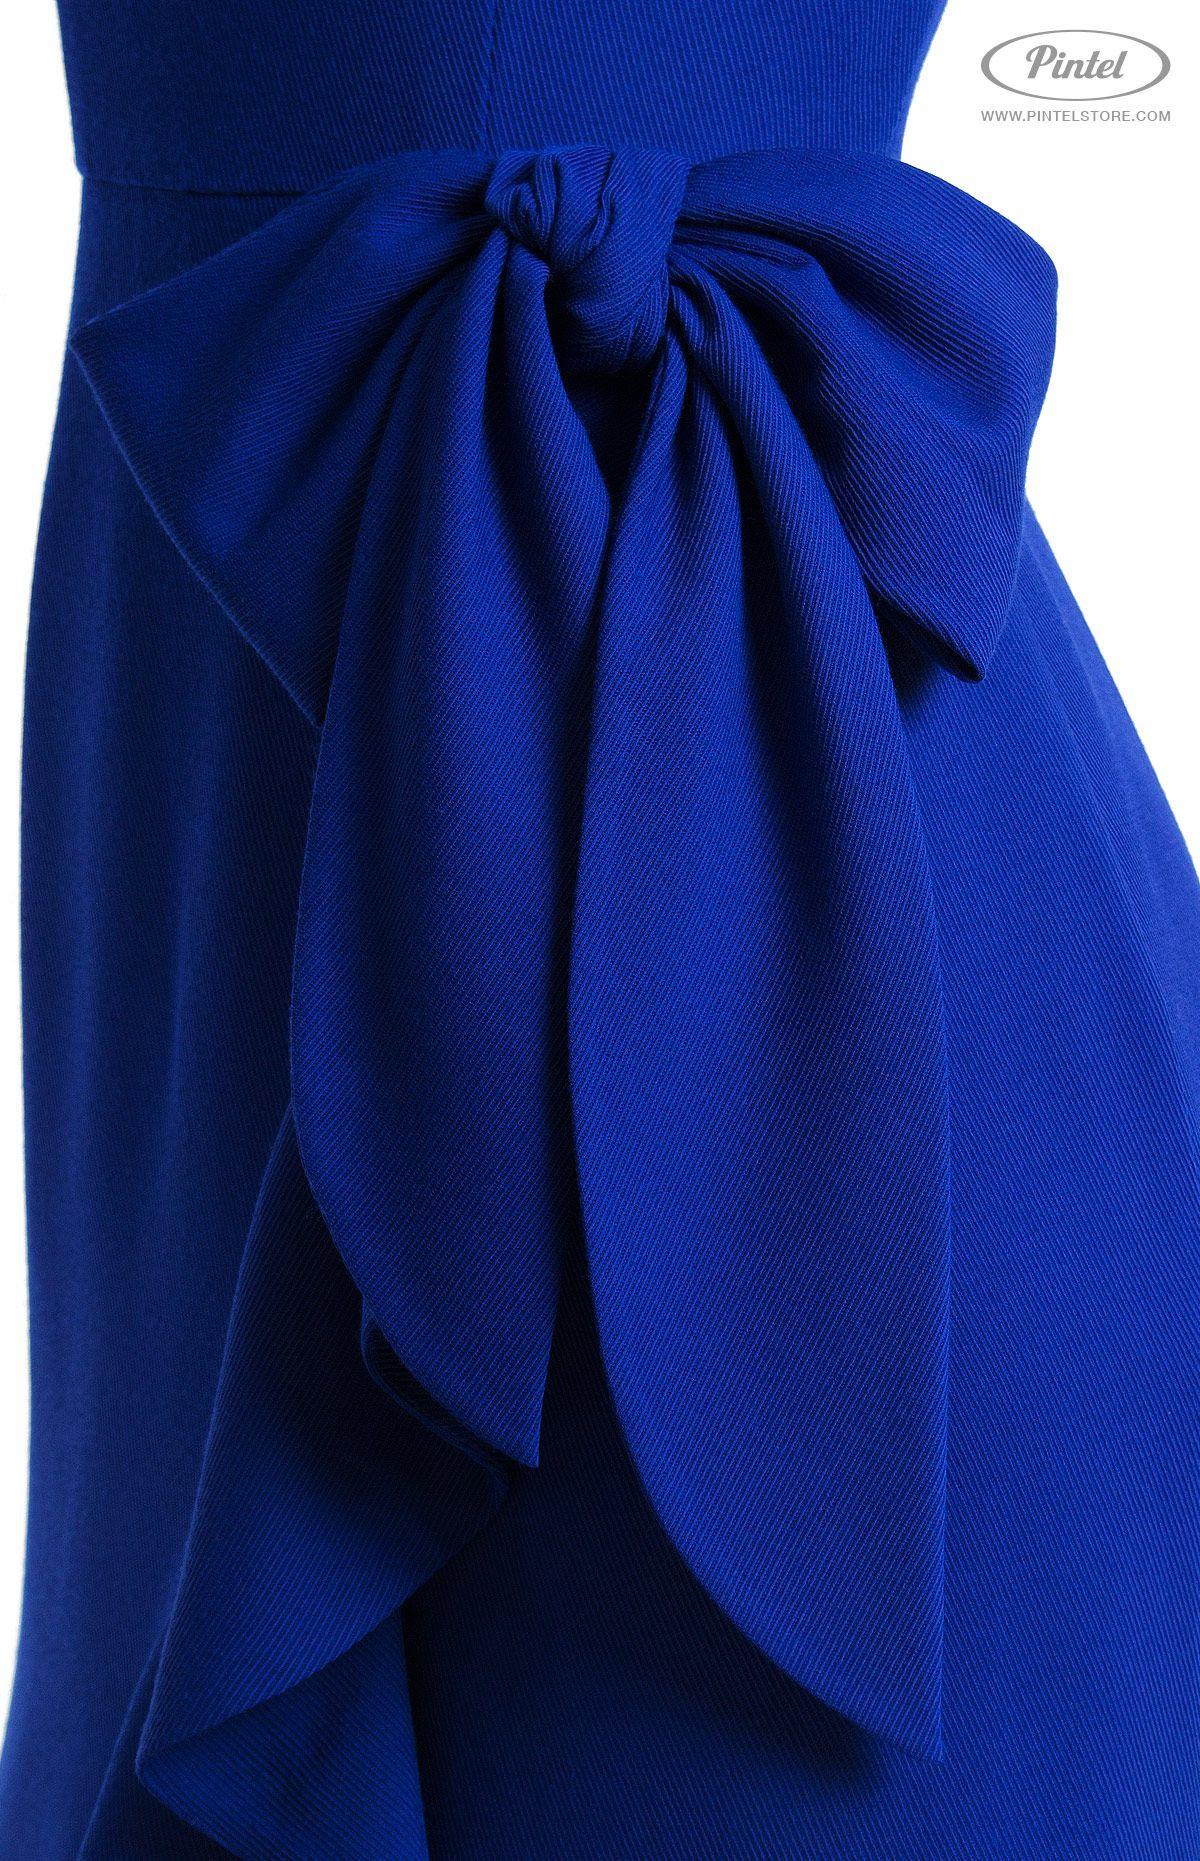 Slimfit genuine wool dress with flounce single cut long sleeve